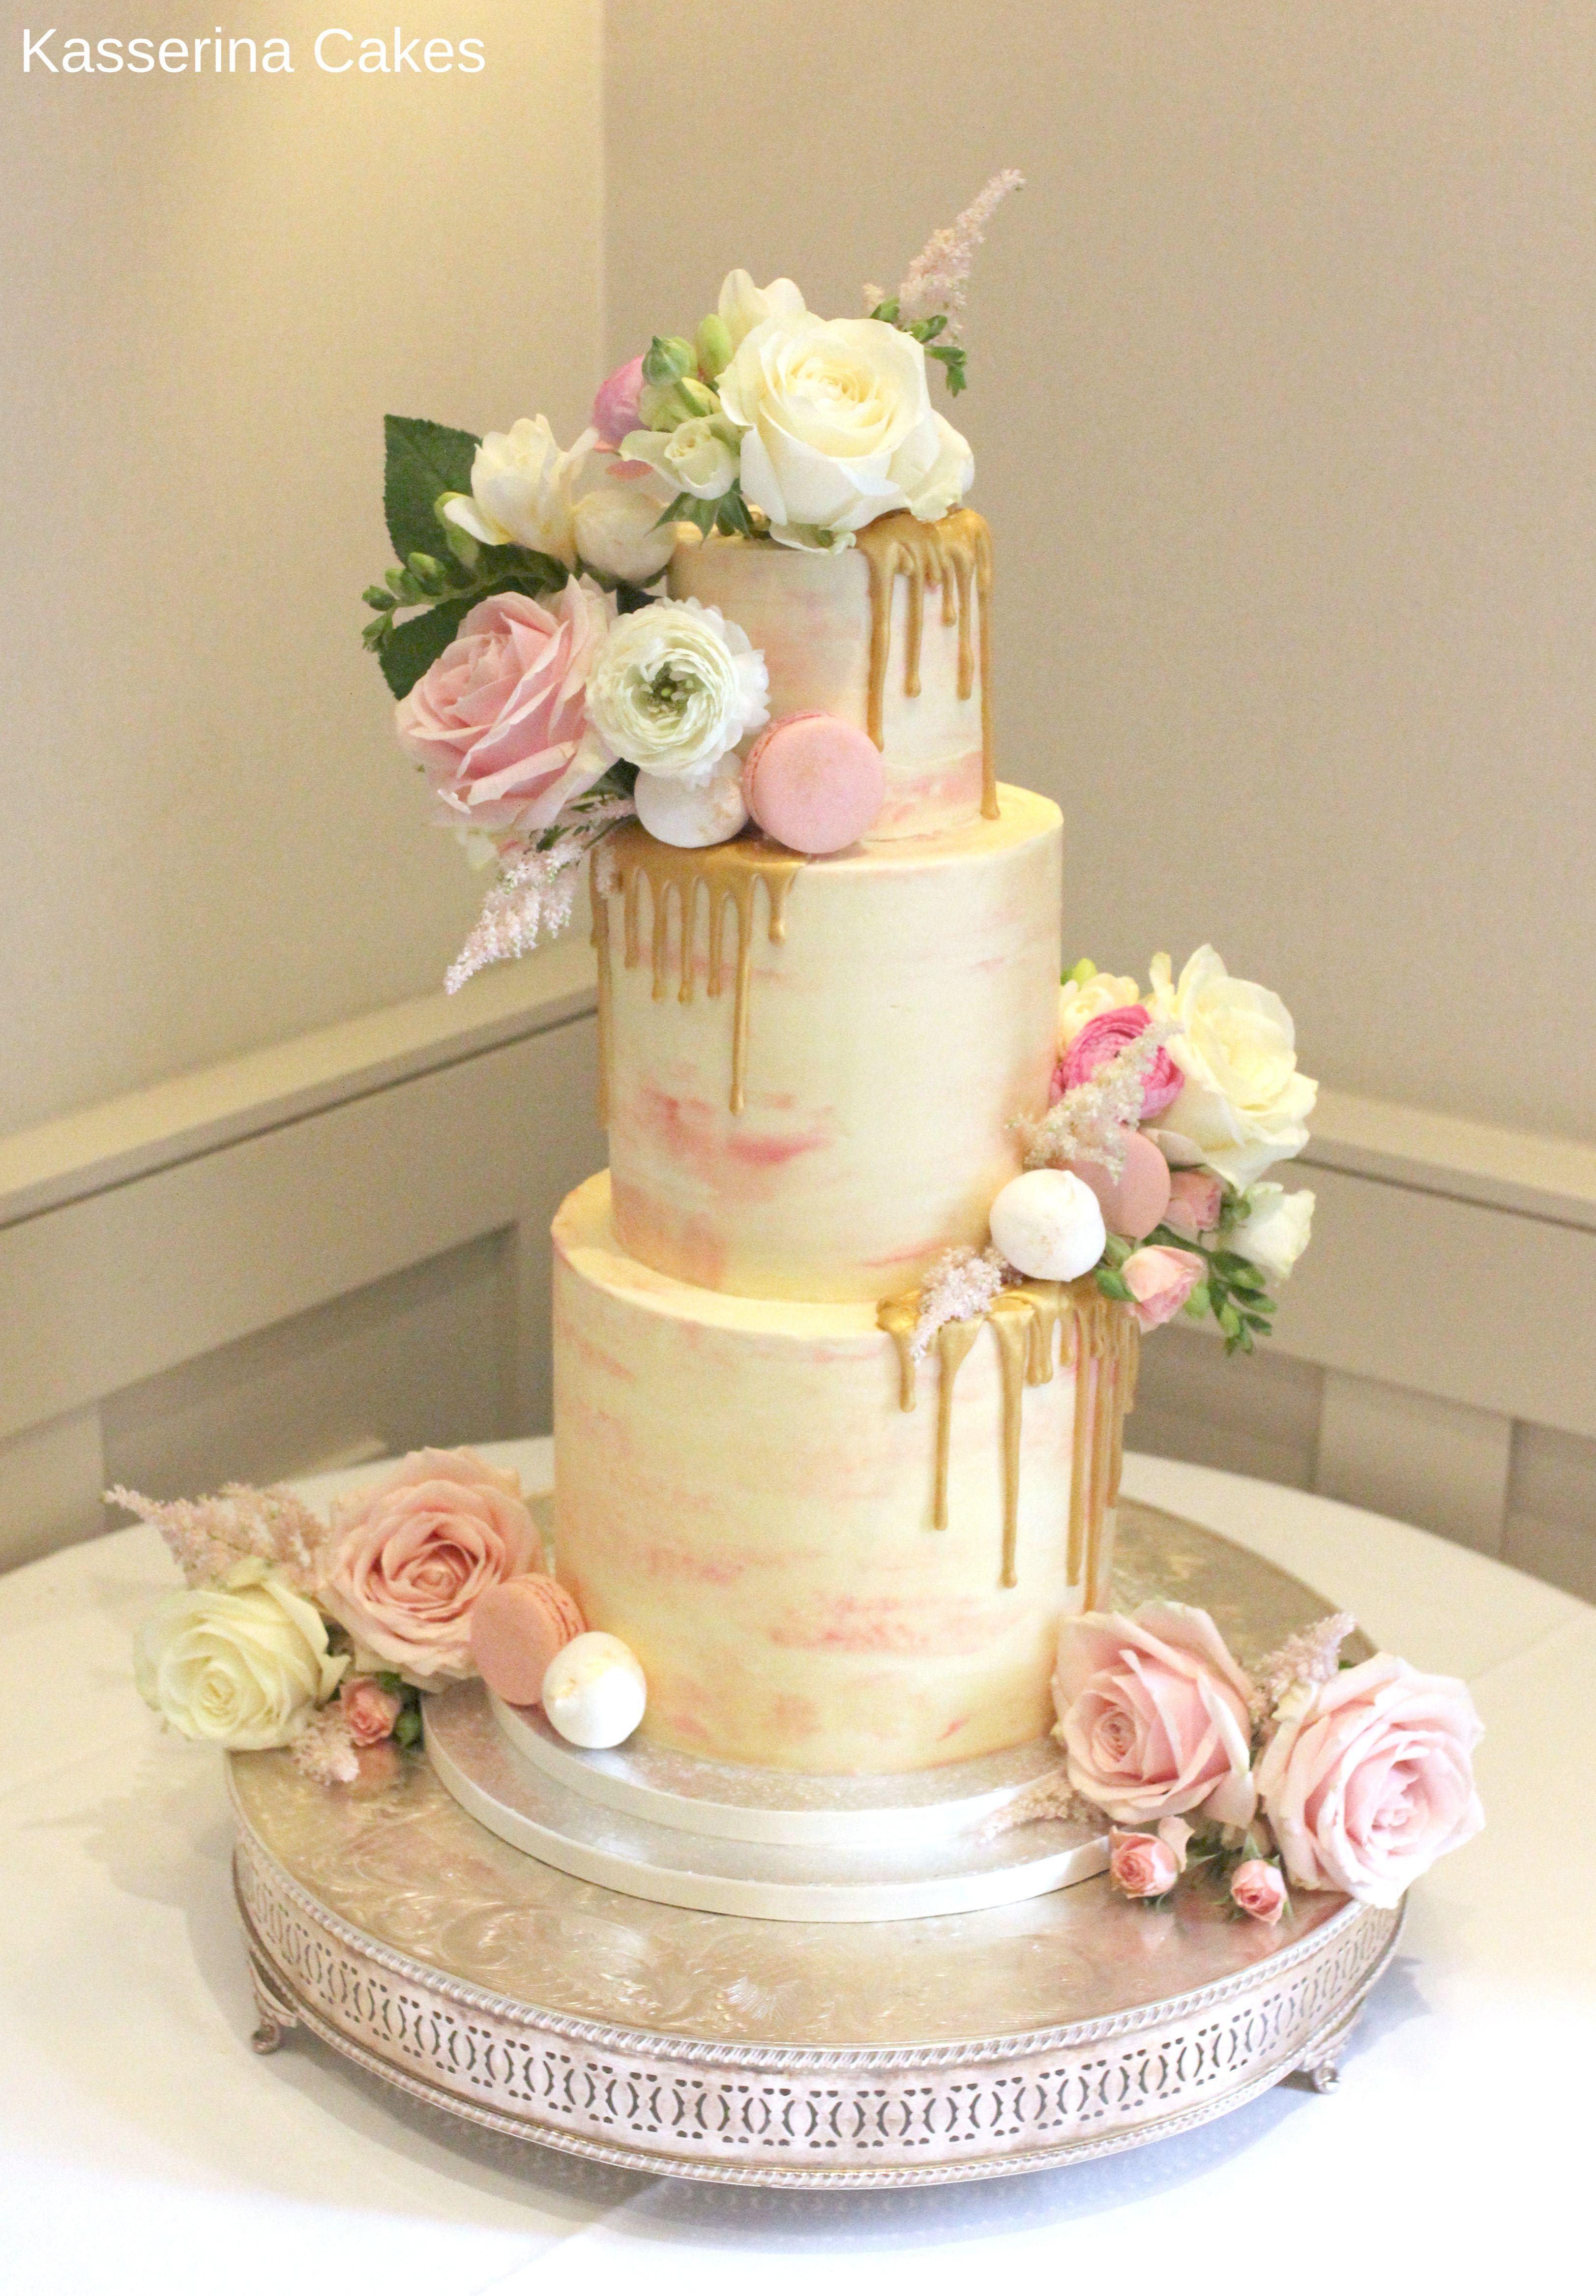 Watercolour effect buttercream wedding cake with fresh flowers ...